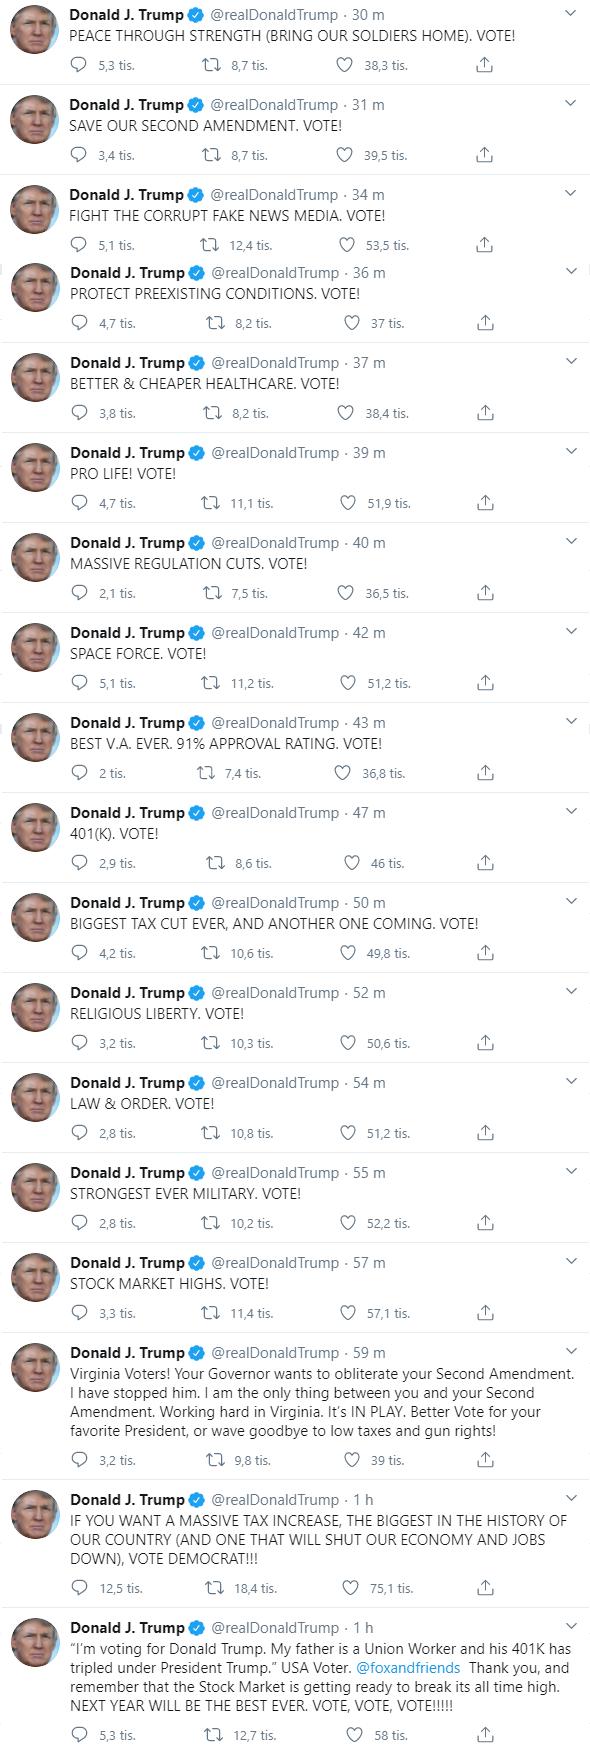 screencapture-twitter-realdonaldtrump-2020-10-05-13-45-20